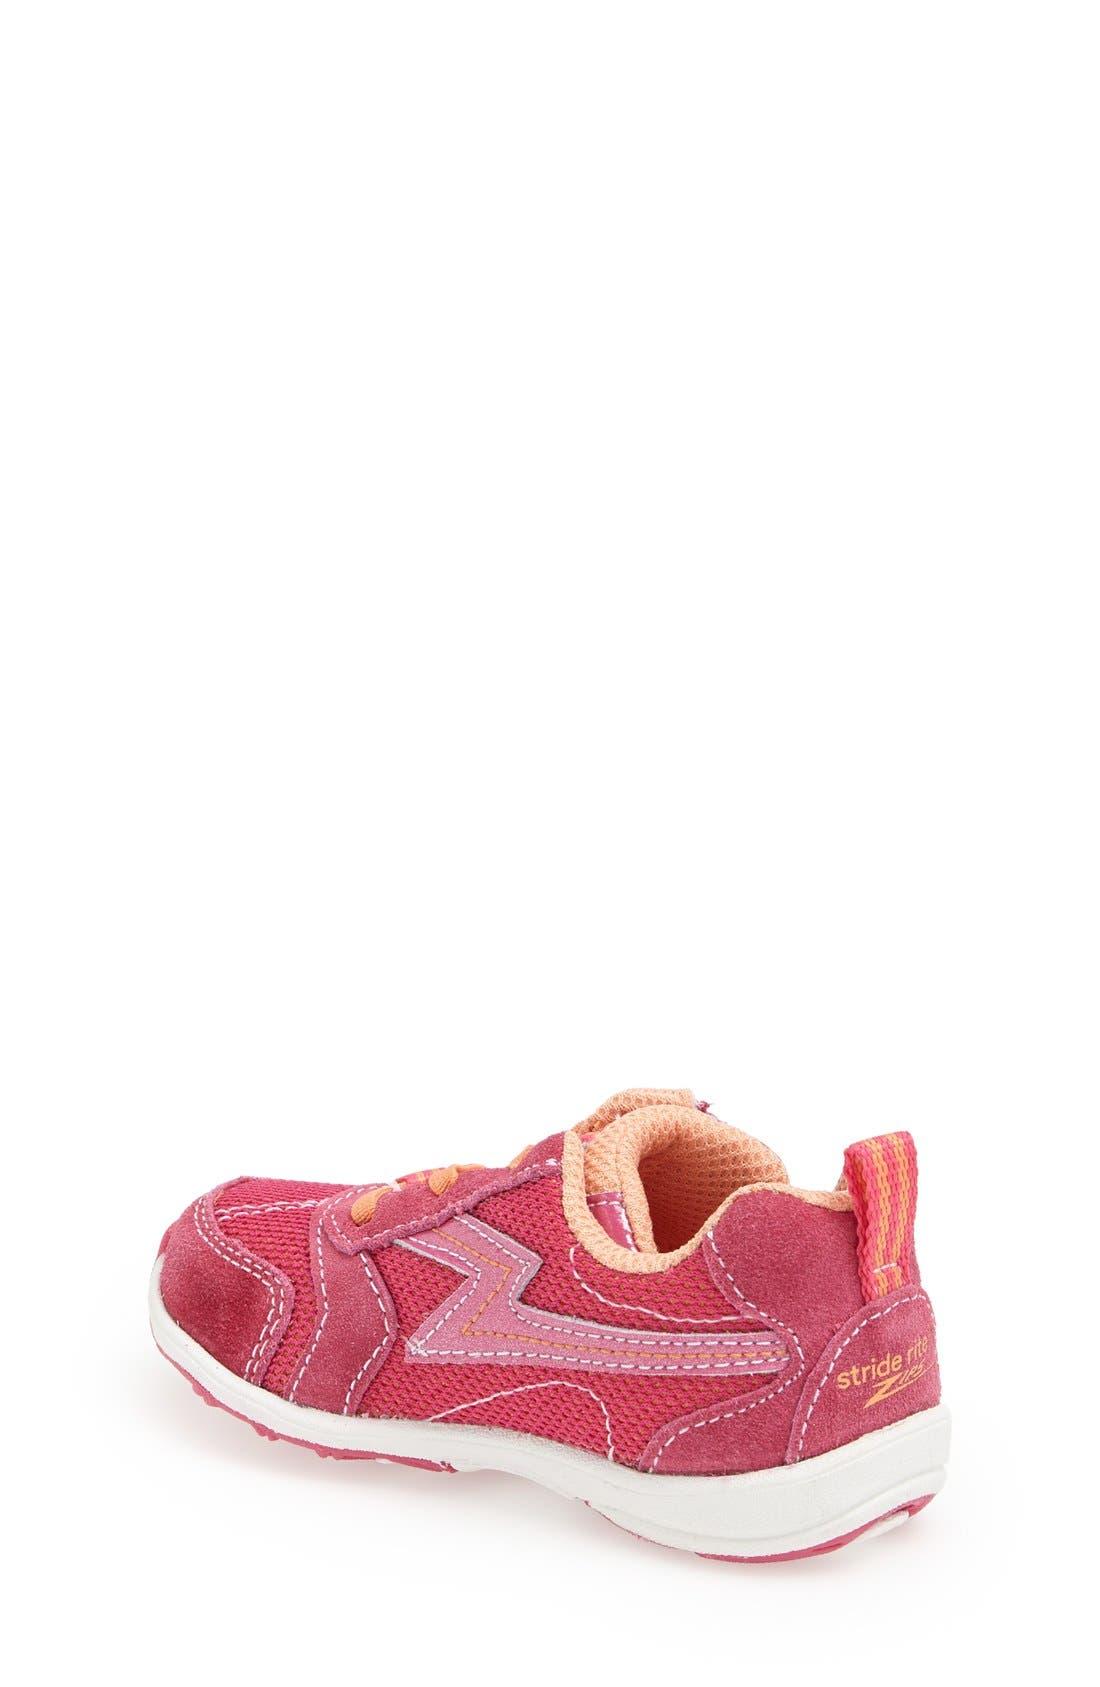 Alternate Image 2  - Stride Rite 'Zips' Sneaker (Walker & Toddler)